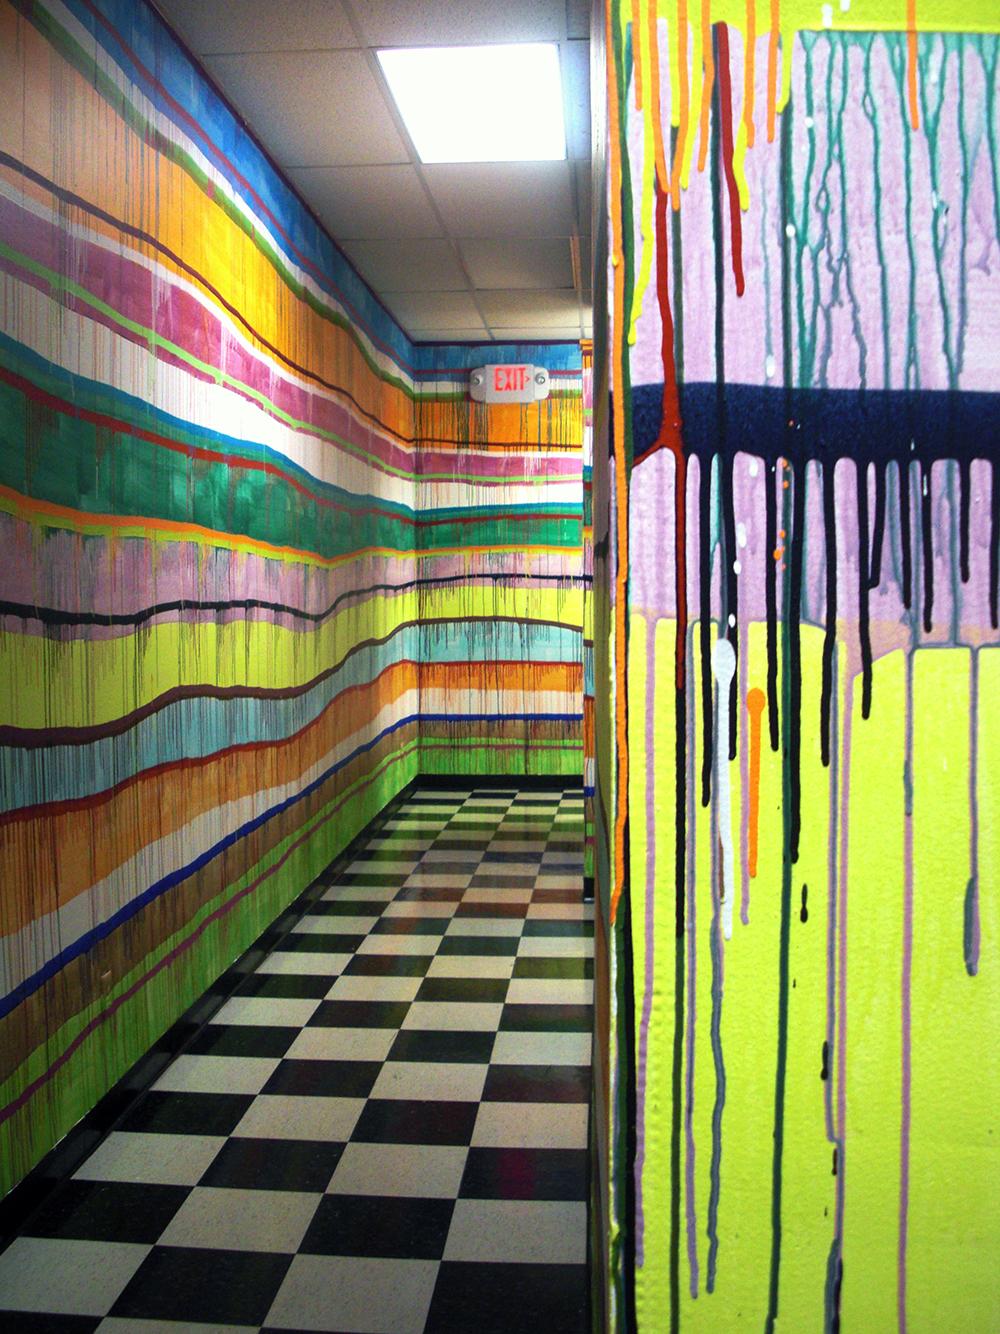 jeon-ju-hallway-2.jpg